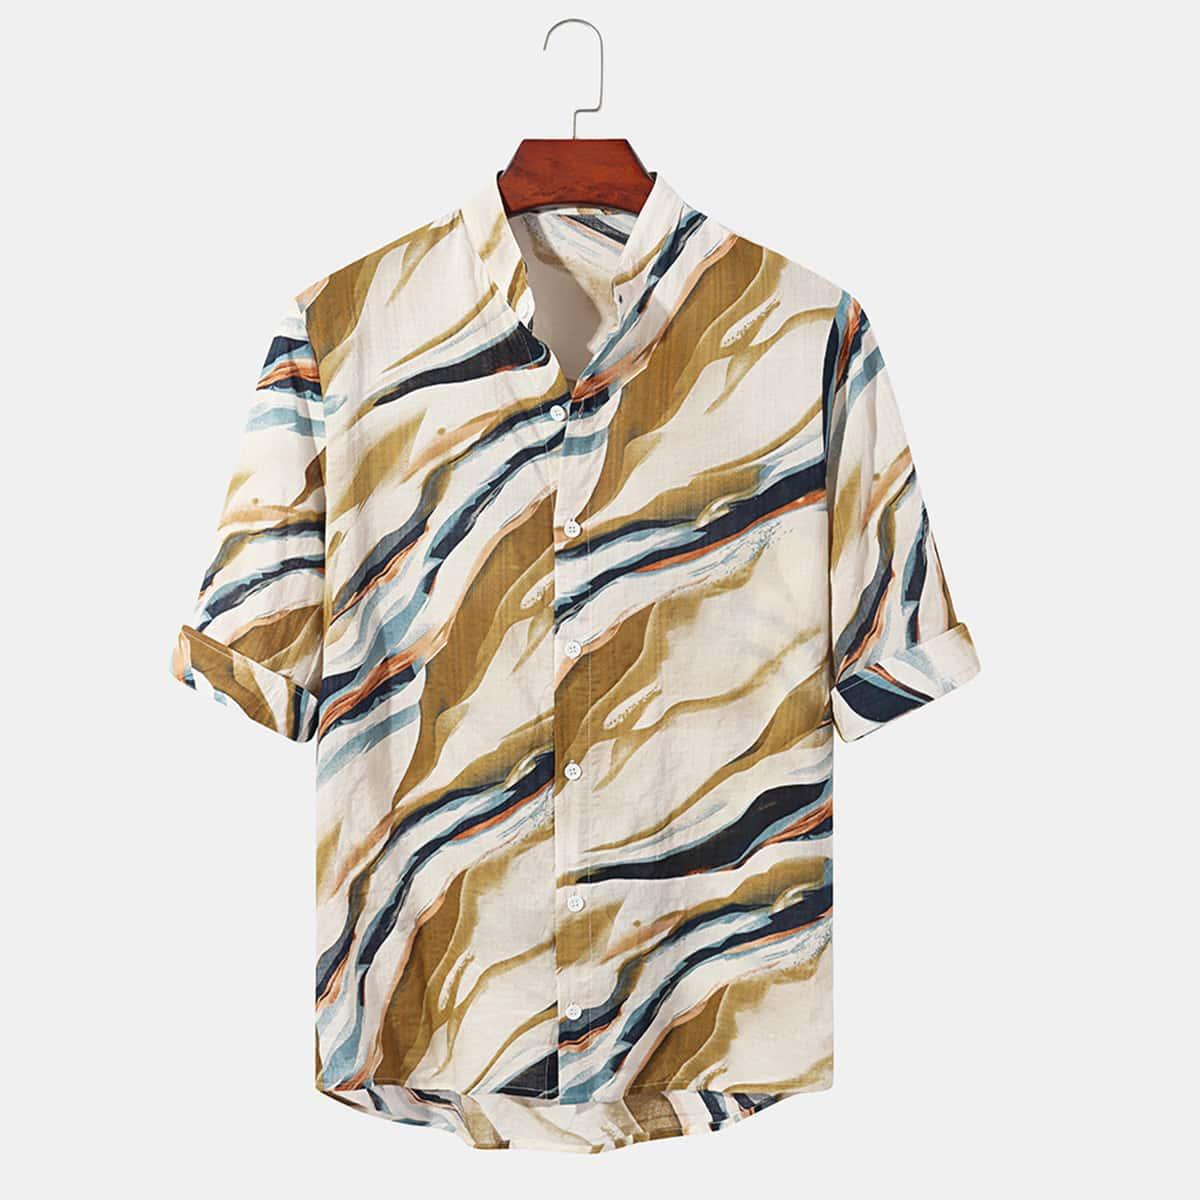 Мужской Рубашка с принтом на пуговицах с коротким рукавом